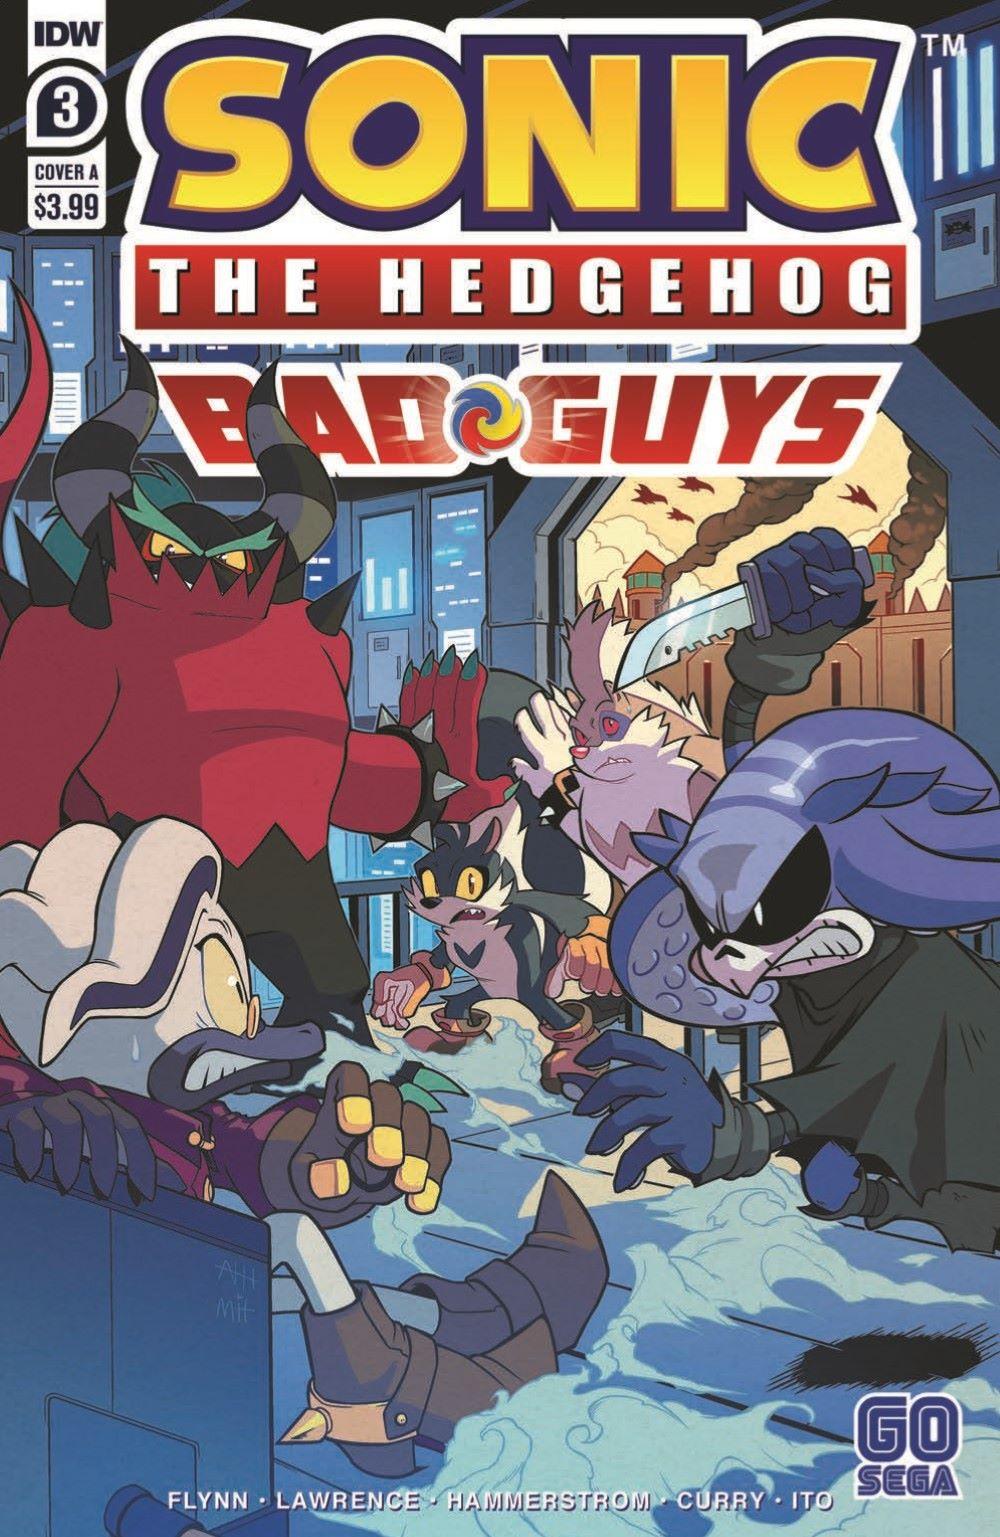 STH-BG03_pr-1 ComicList Previews: SONIC THE HEDGEHOG BAD GUYS #3 (OF 4)